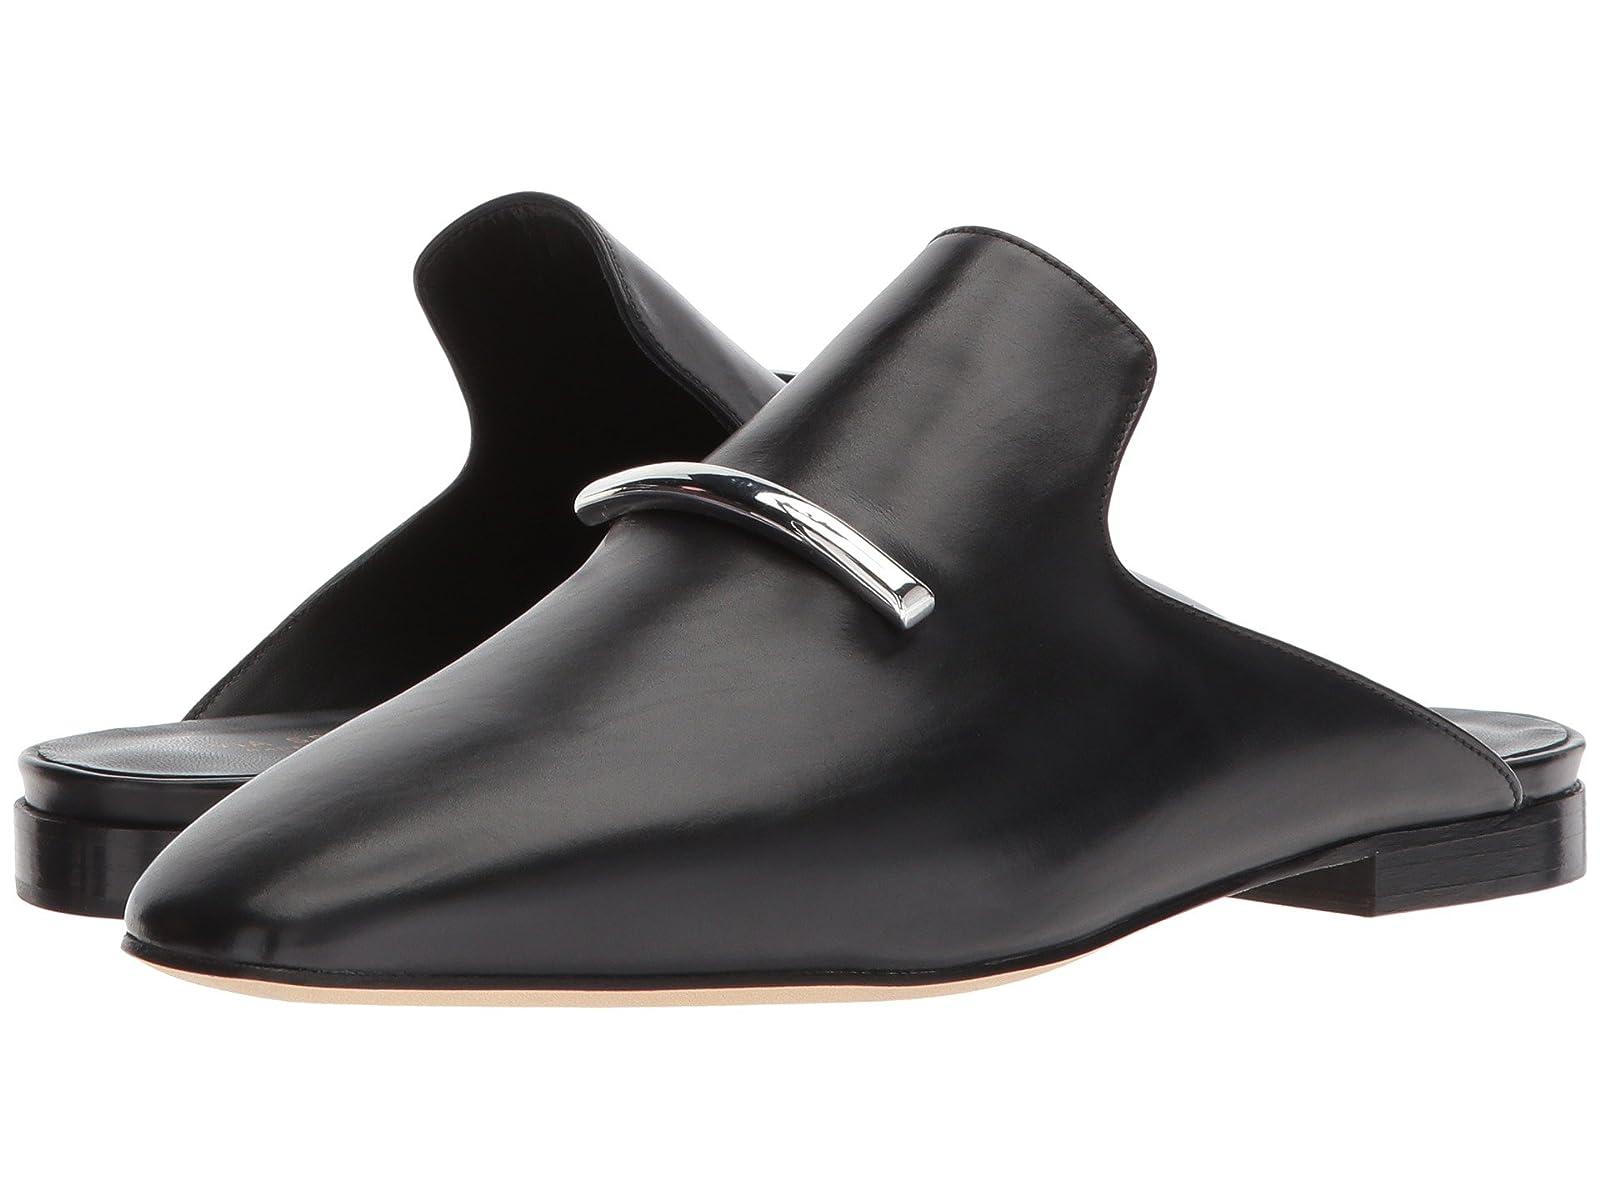 Via Spiga TaraCheap and distinctive eye-catching shoes